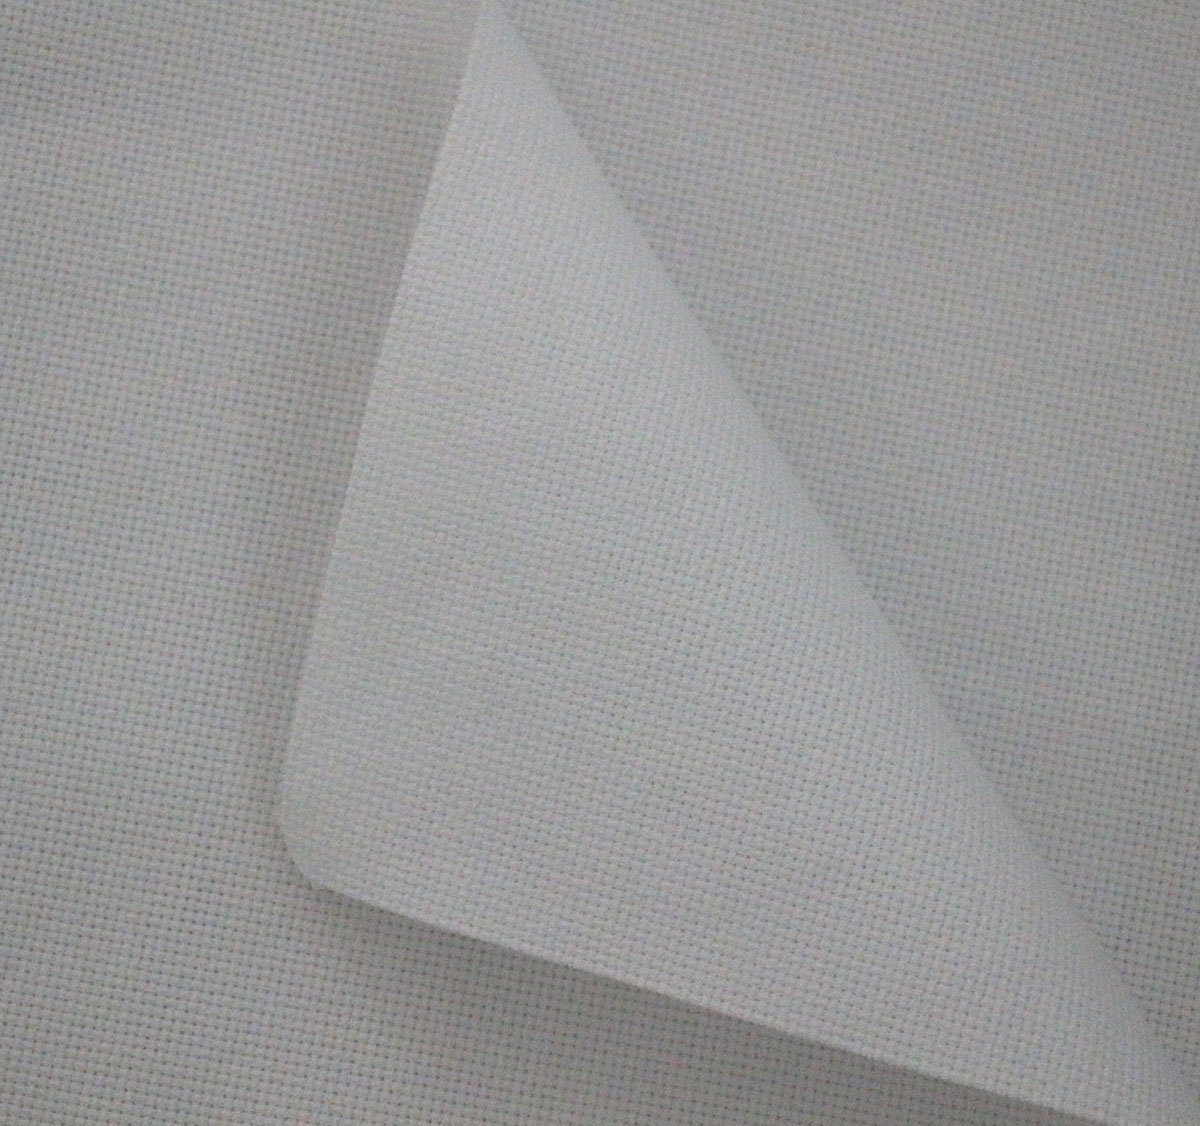 Aida Cloth 14 Count Cross Stitch Fabric, 12 by 12-Inch For DIY - 5 Pieces (White) 12 by 12-Inch For DIY - 5 Pieces (White) RERIVER